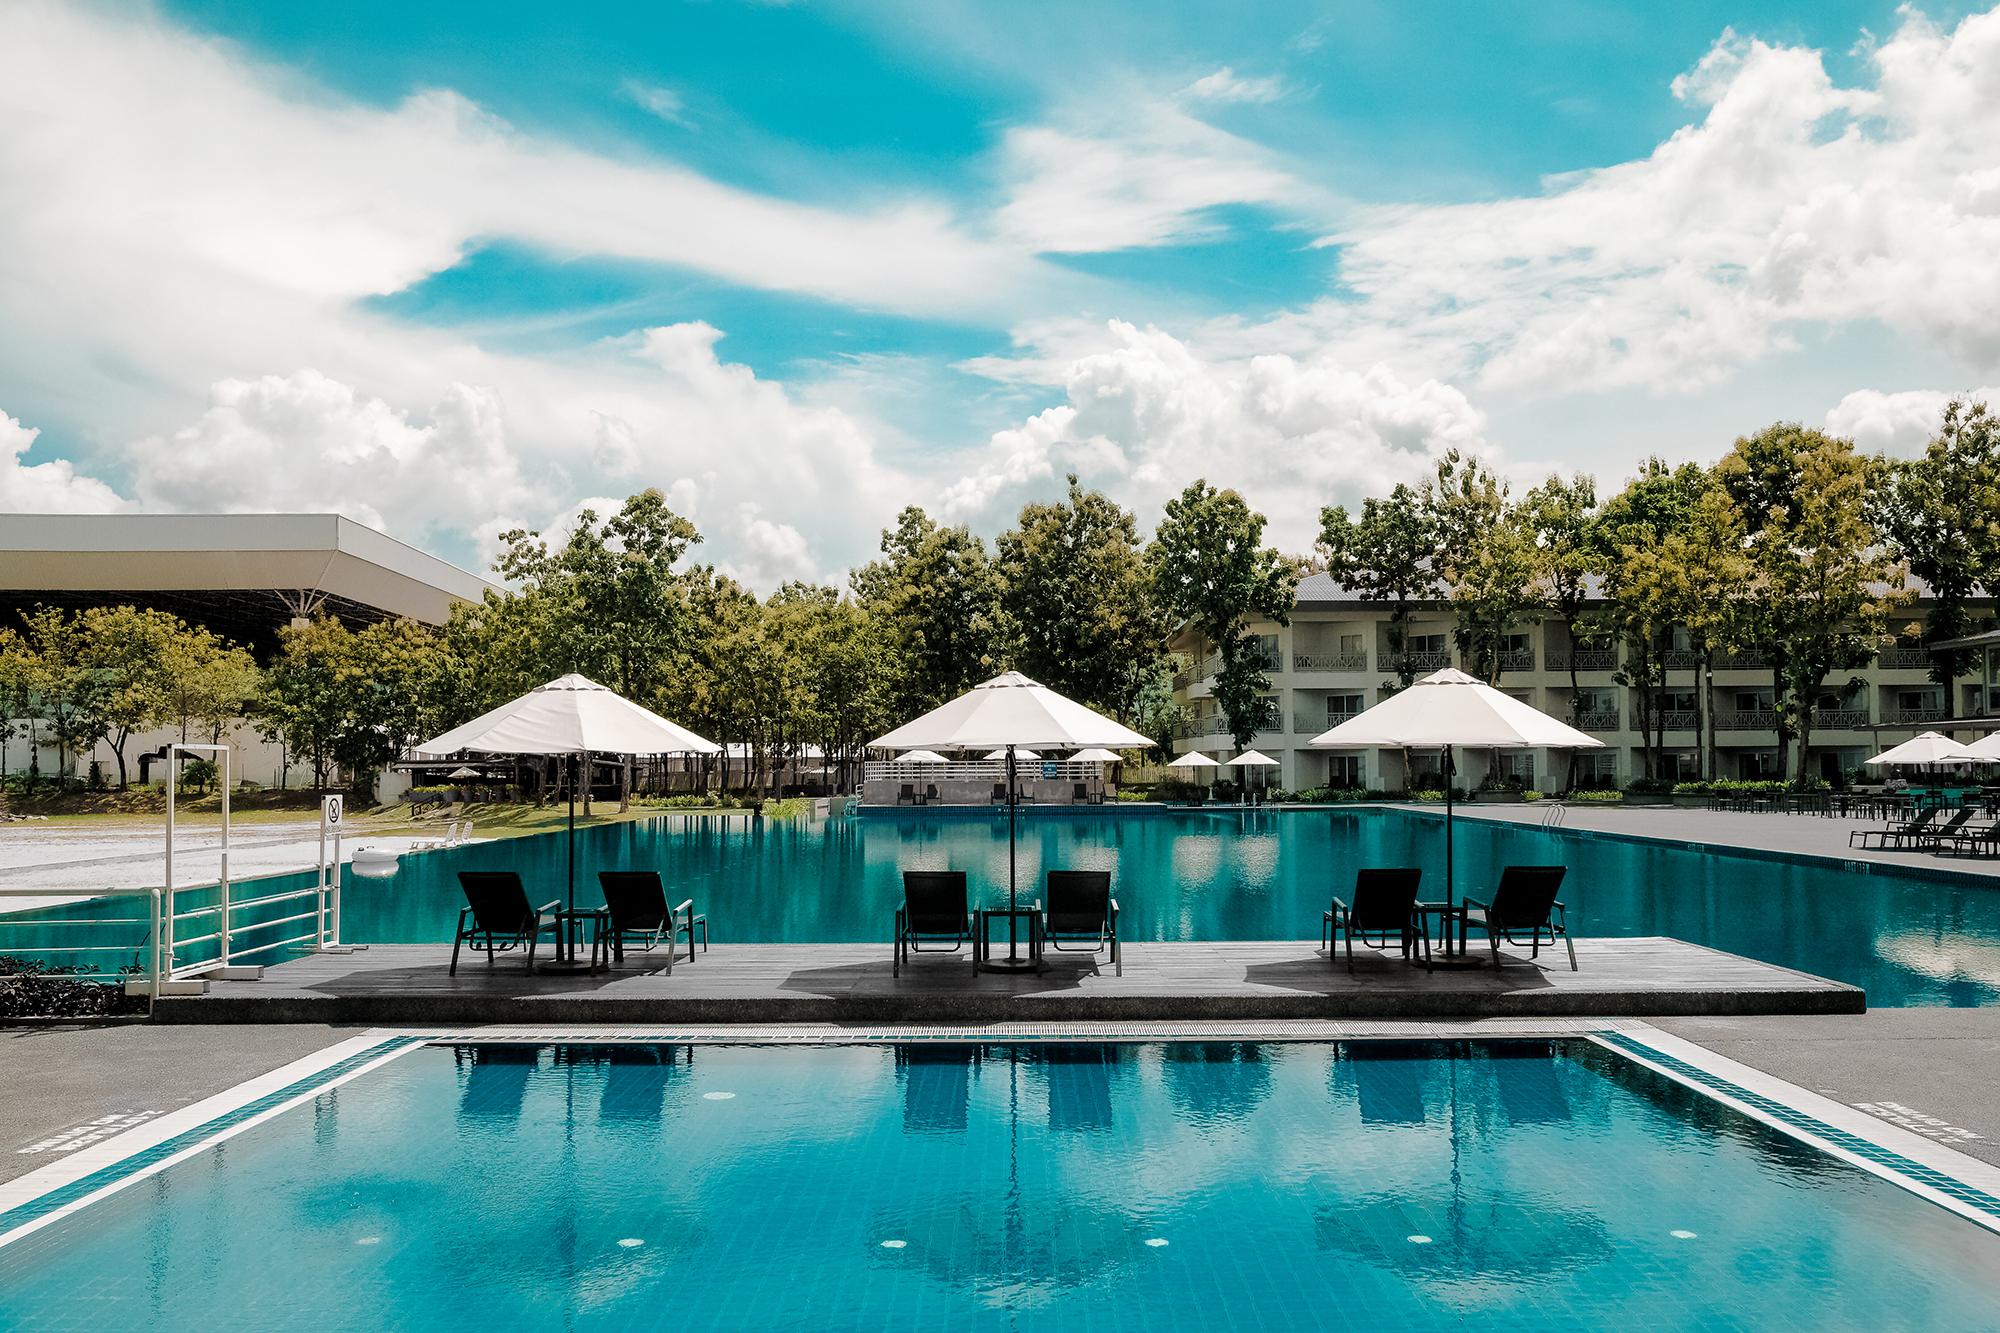 Hotel Pool (Donald Tong)